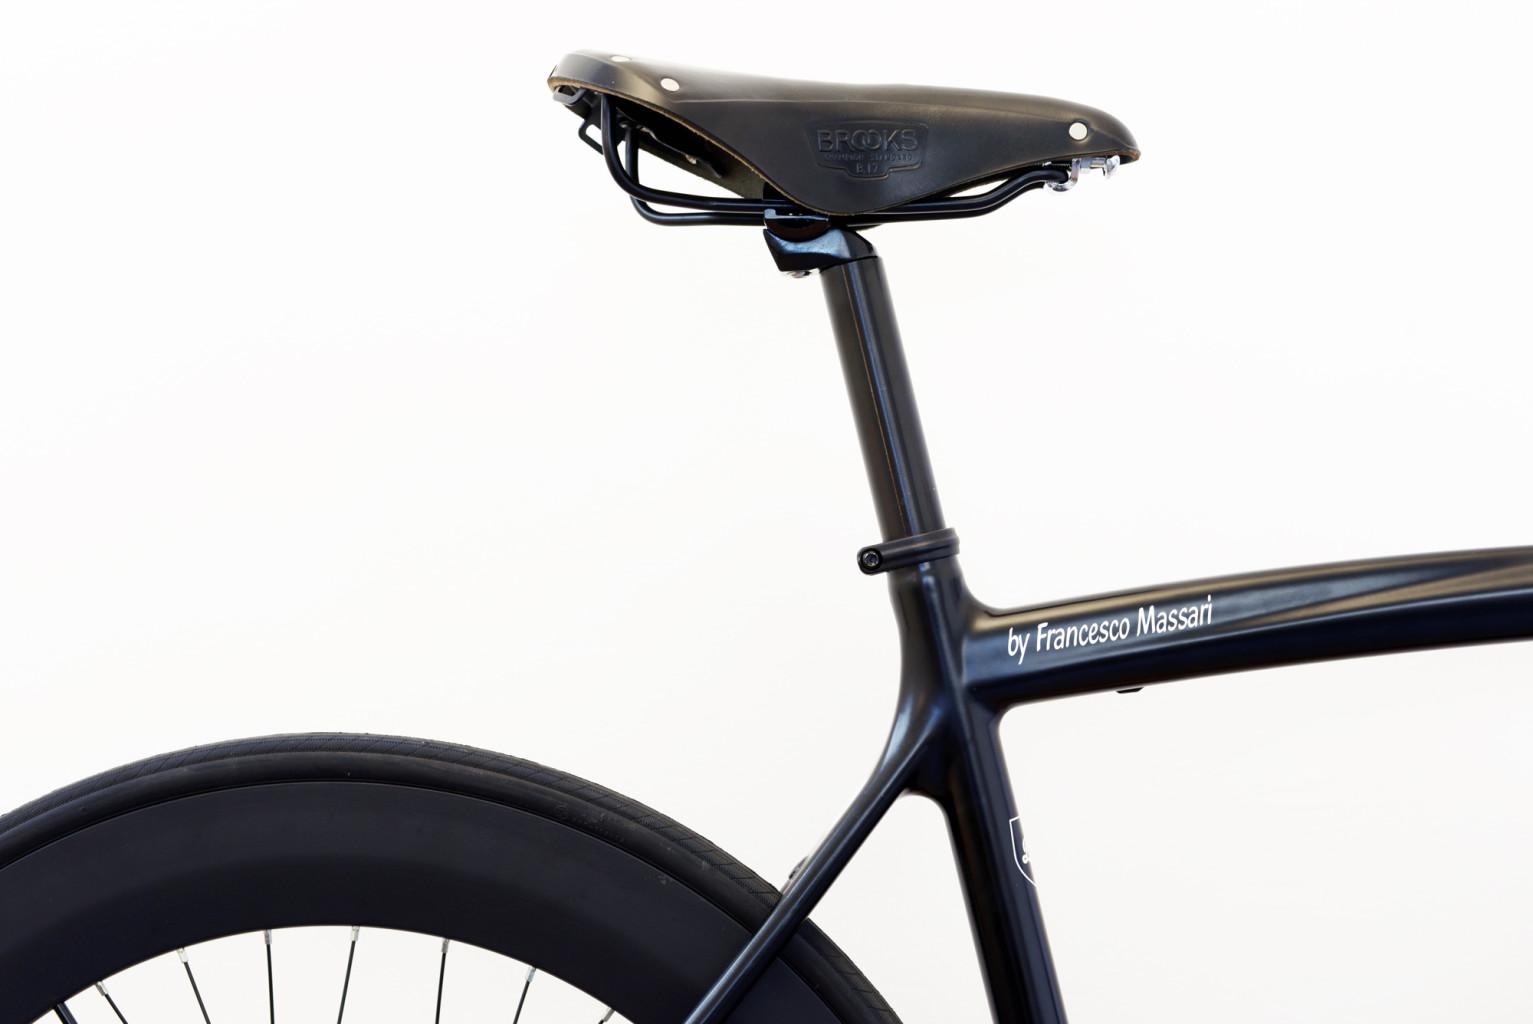 Bespoke bike 22